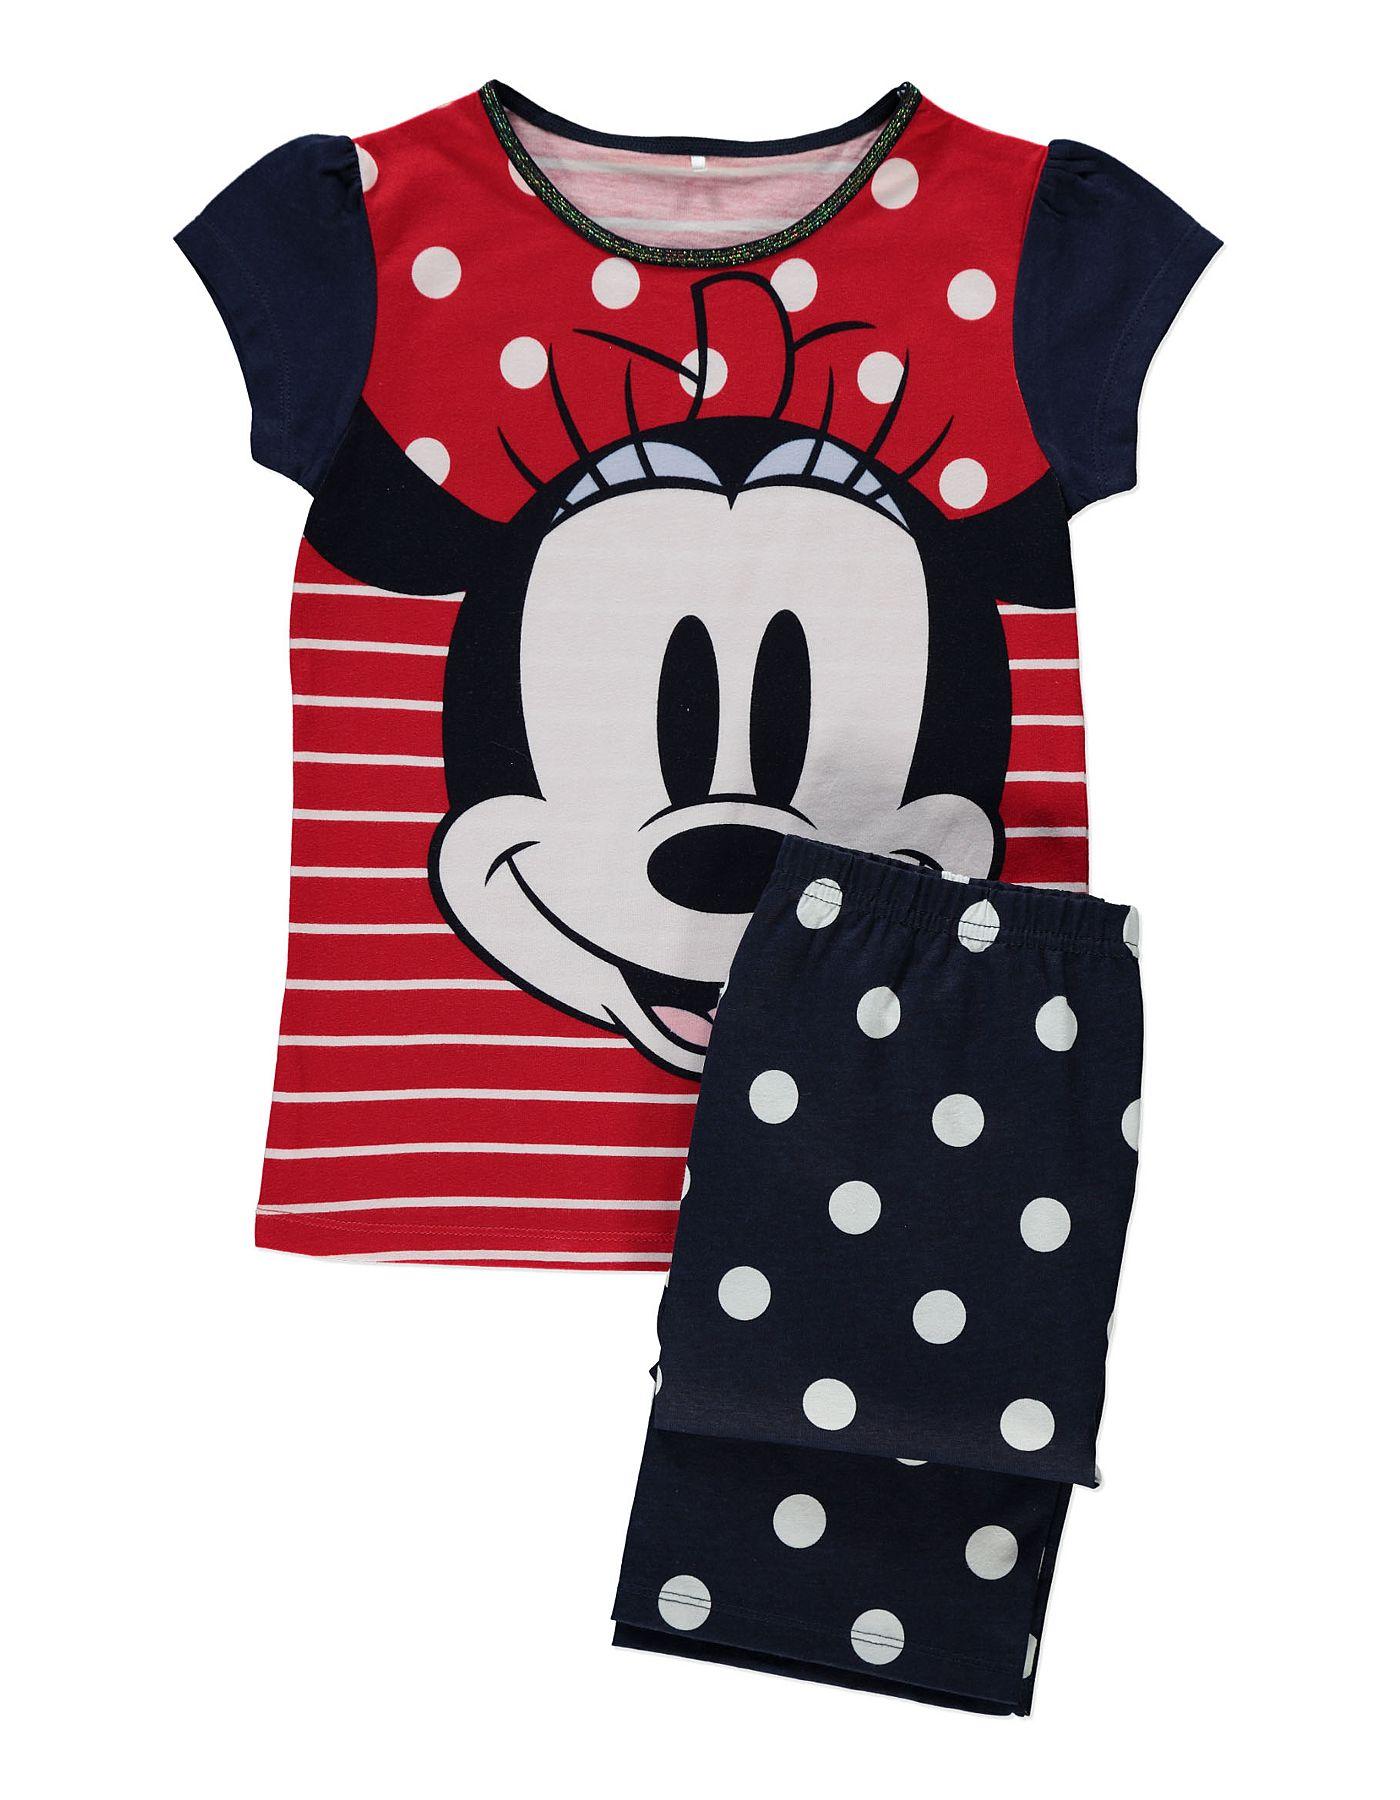 Minnie Mouse Pyjamas Girls at ASDA Disney